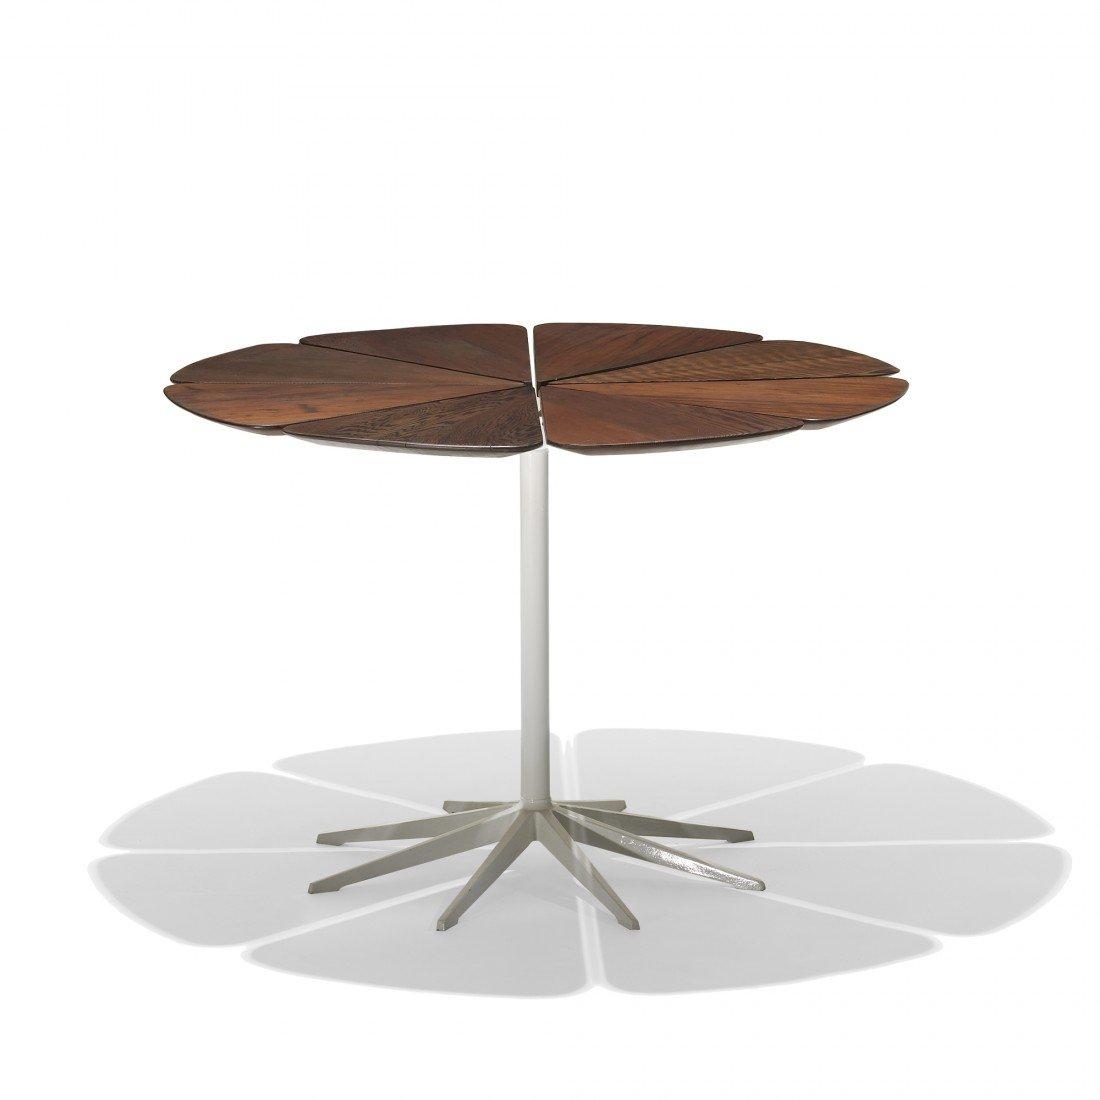 137: Richard Schultz Petal dining table